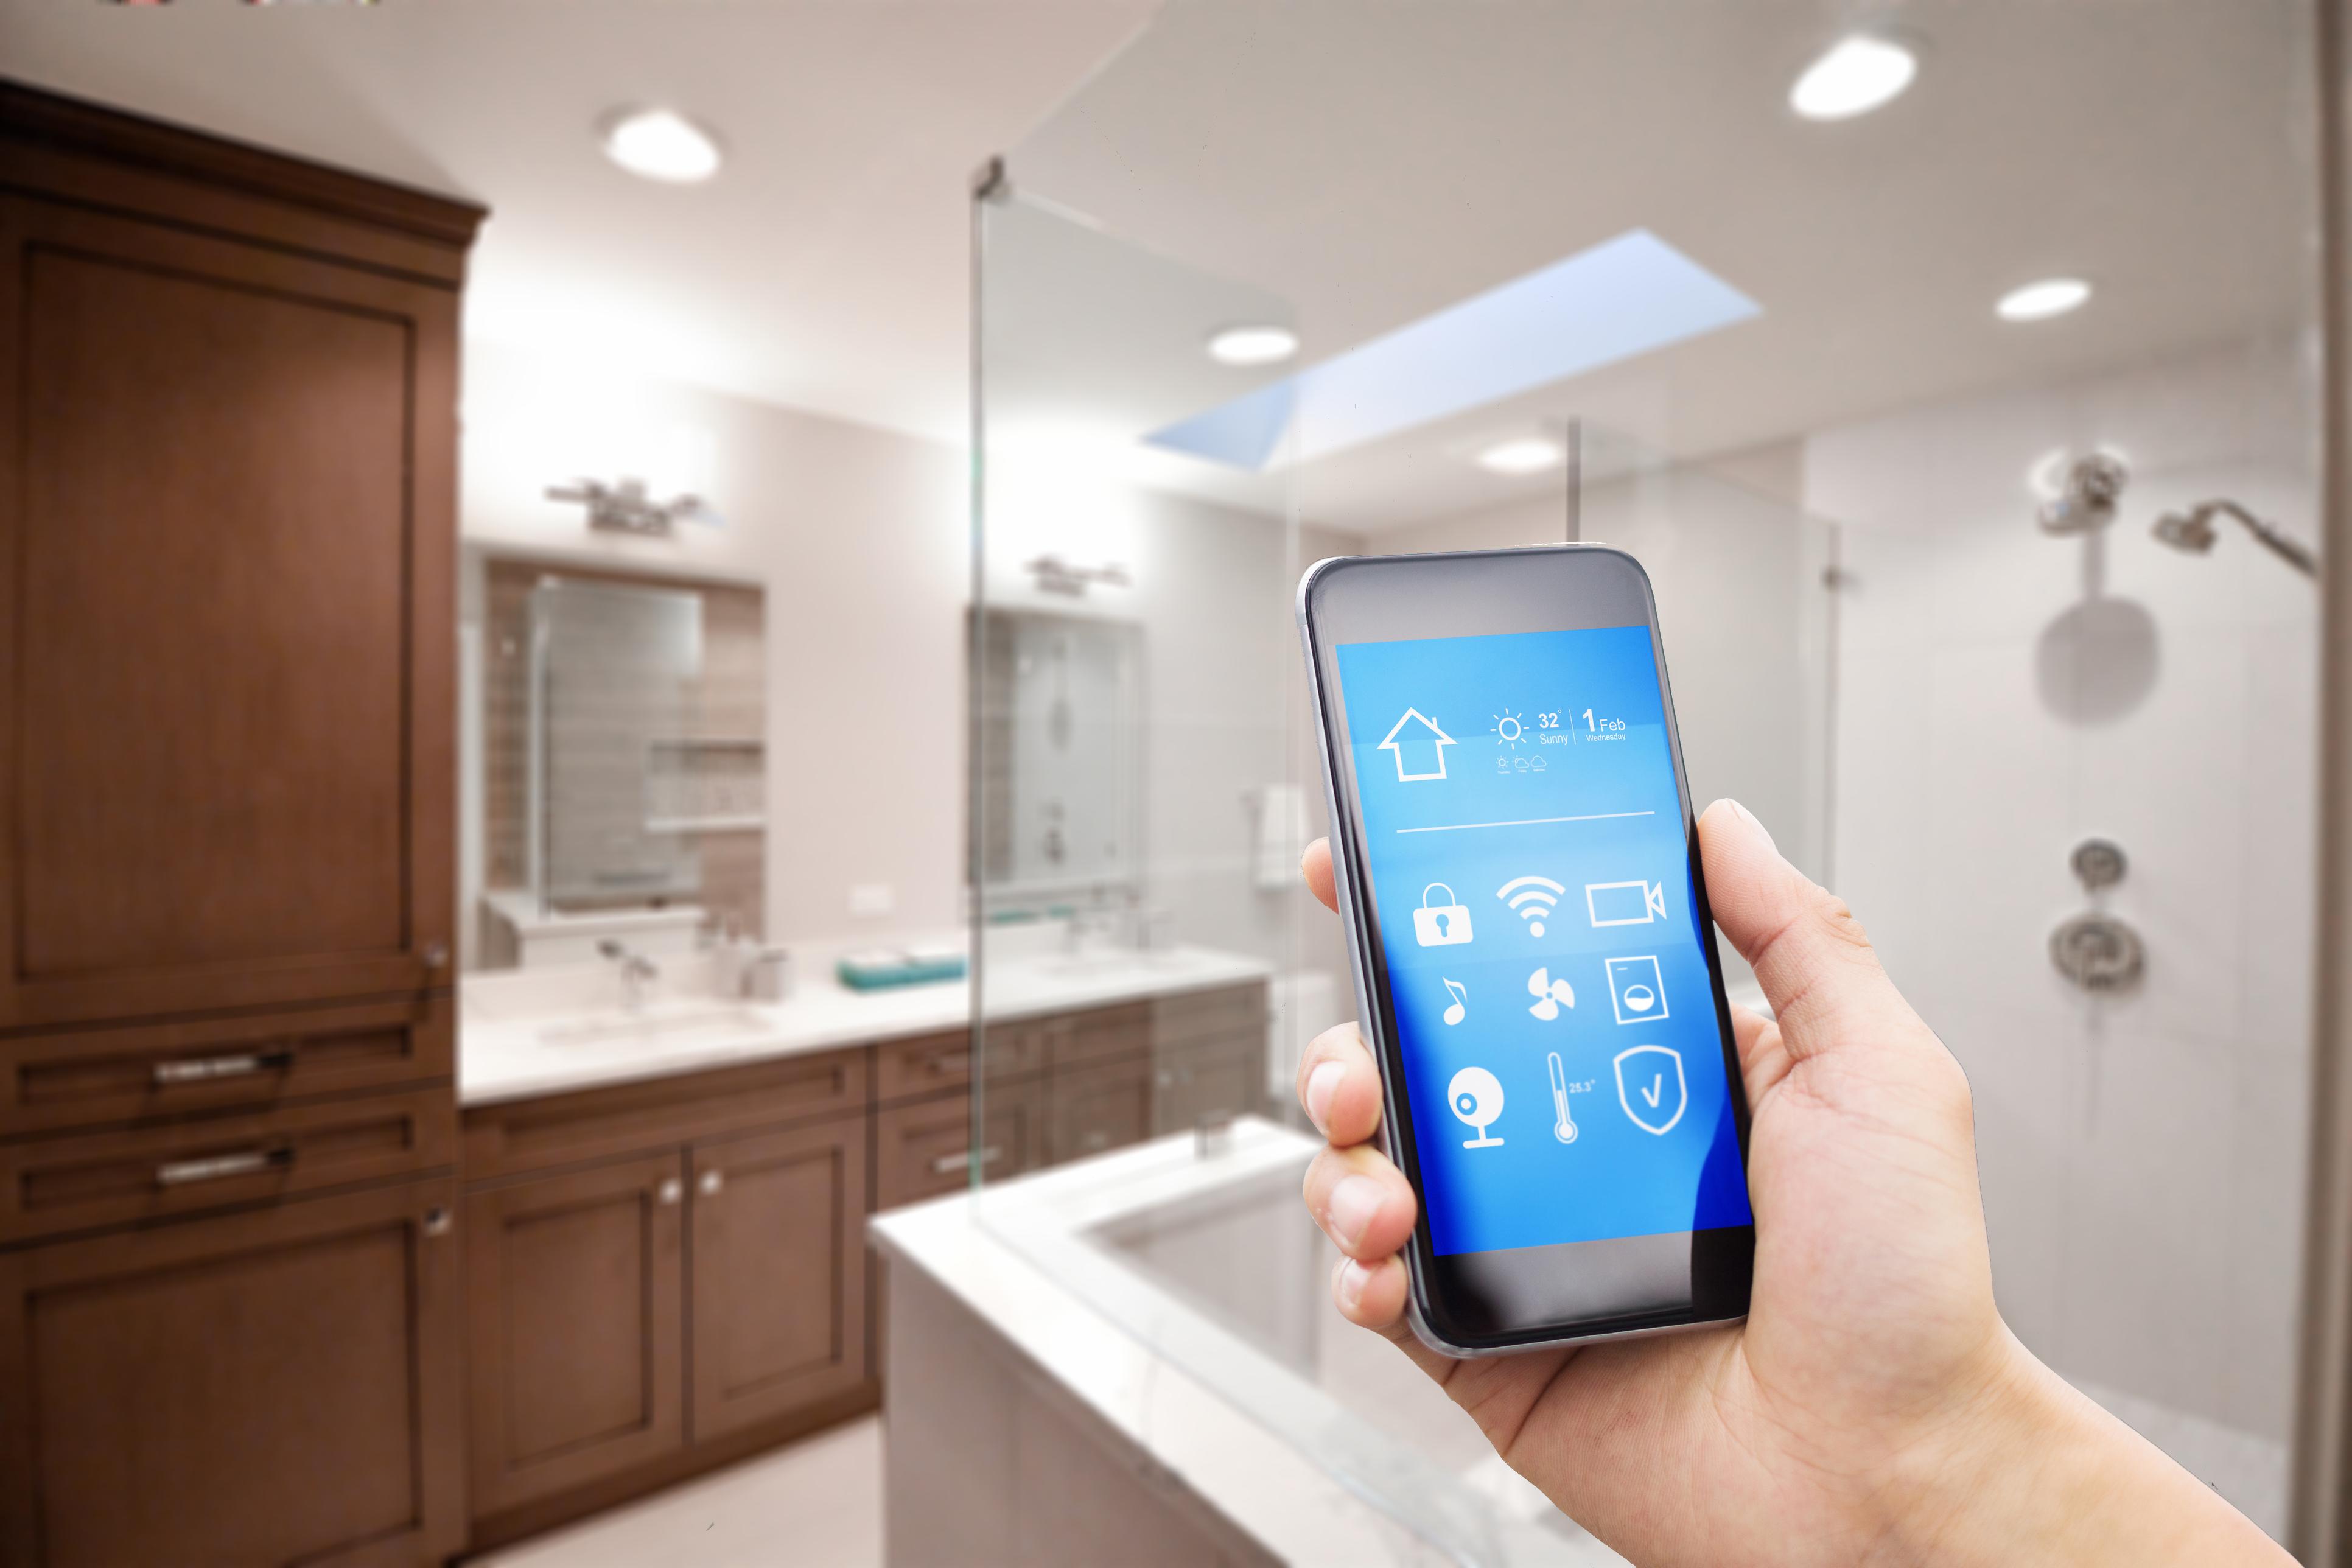 Smart Bathroom Integration -  Smart Home Applications